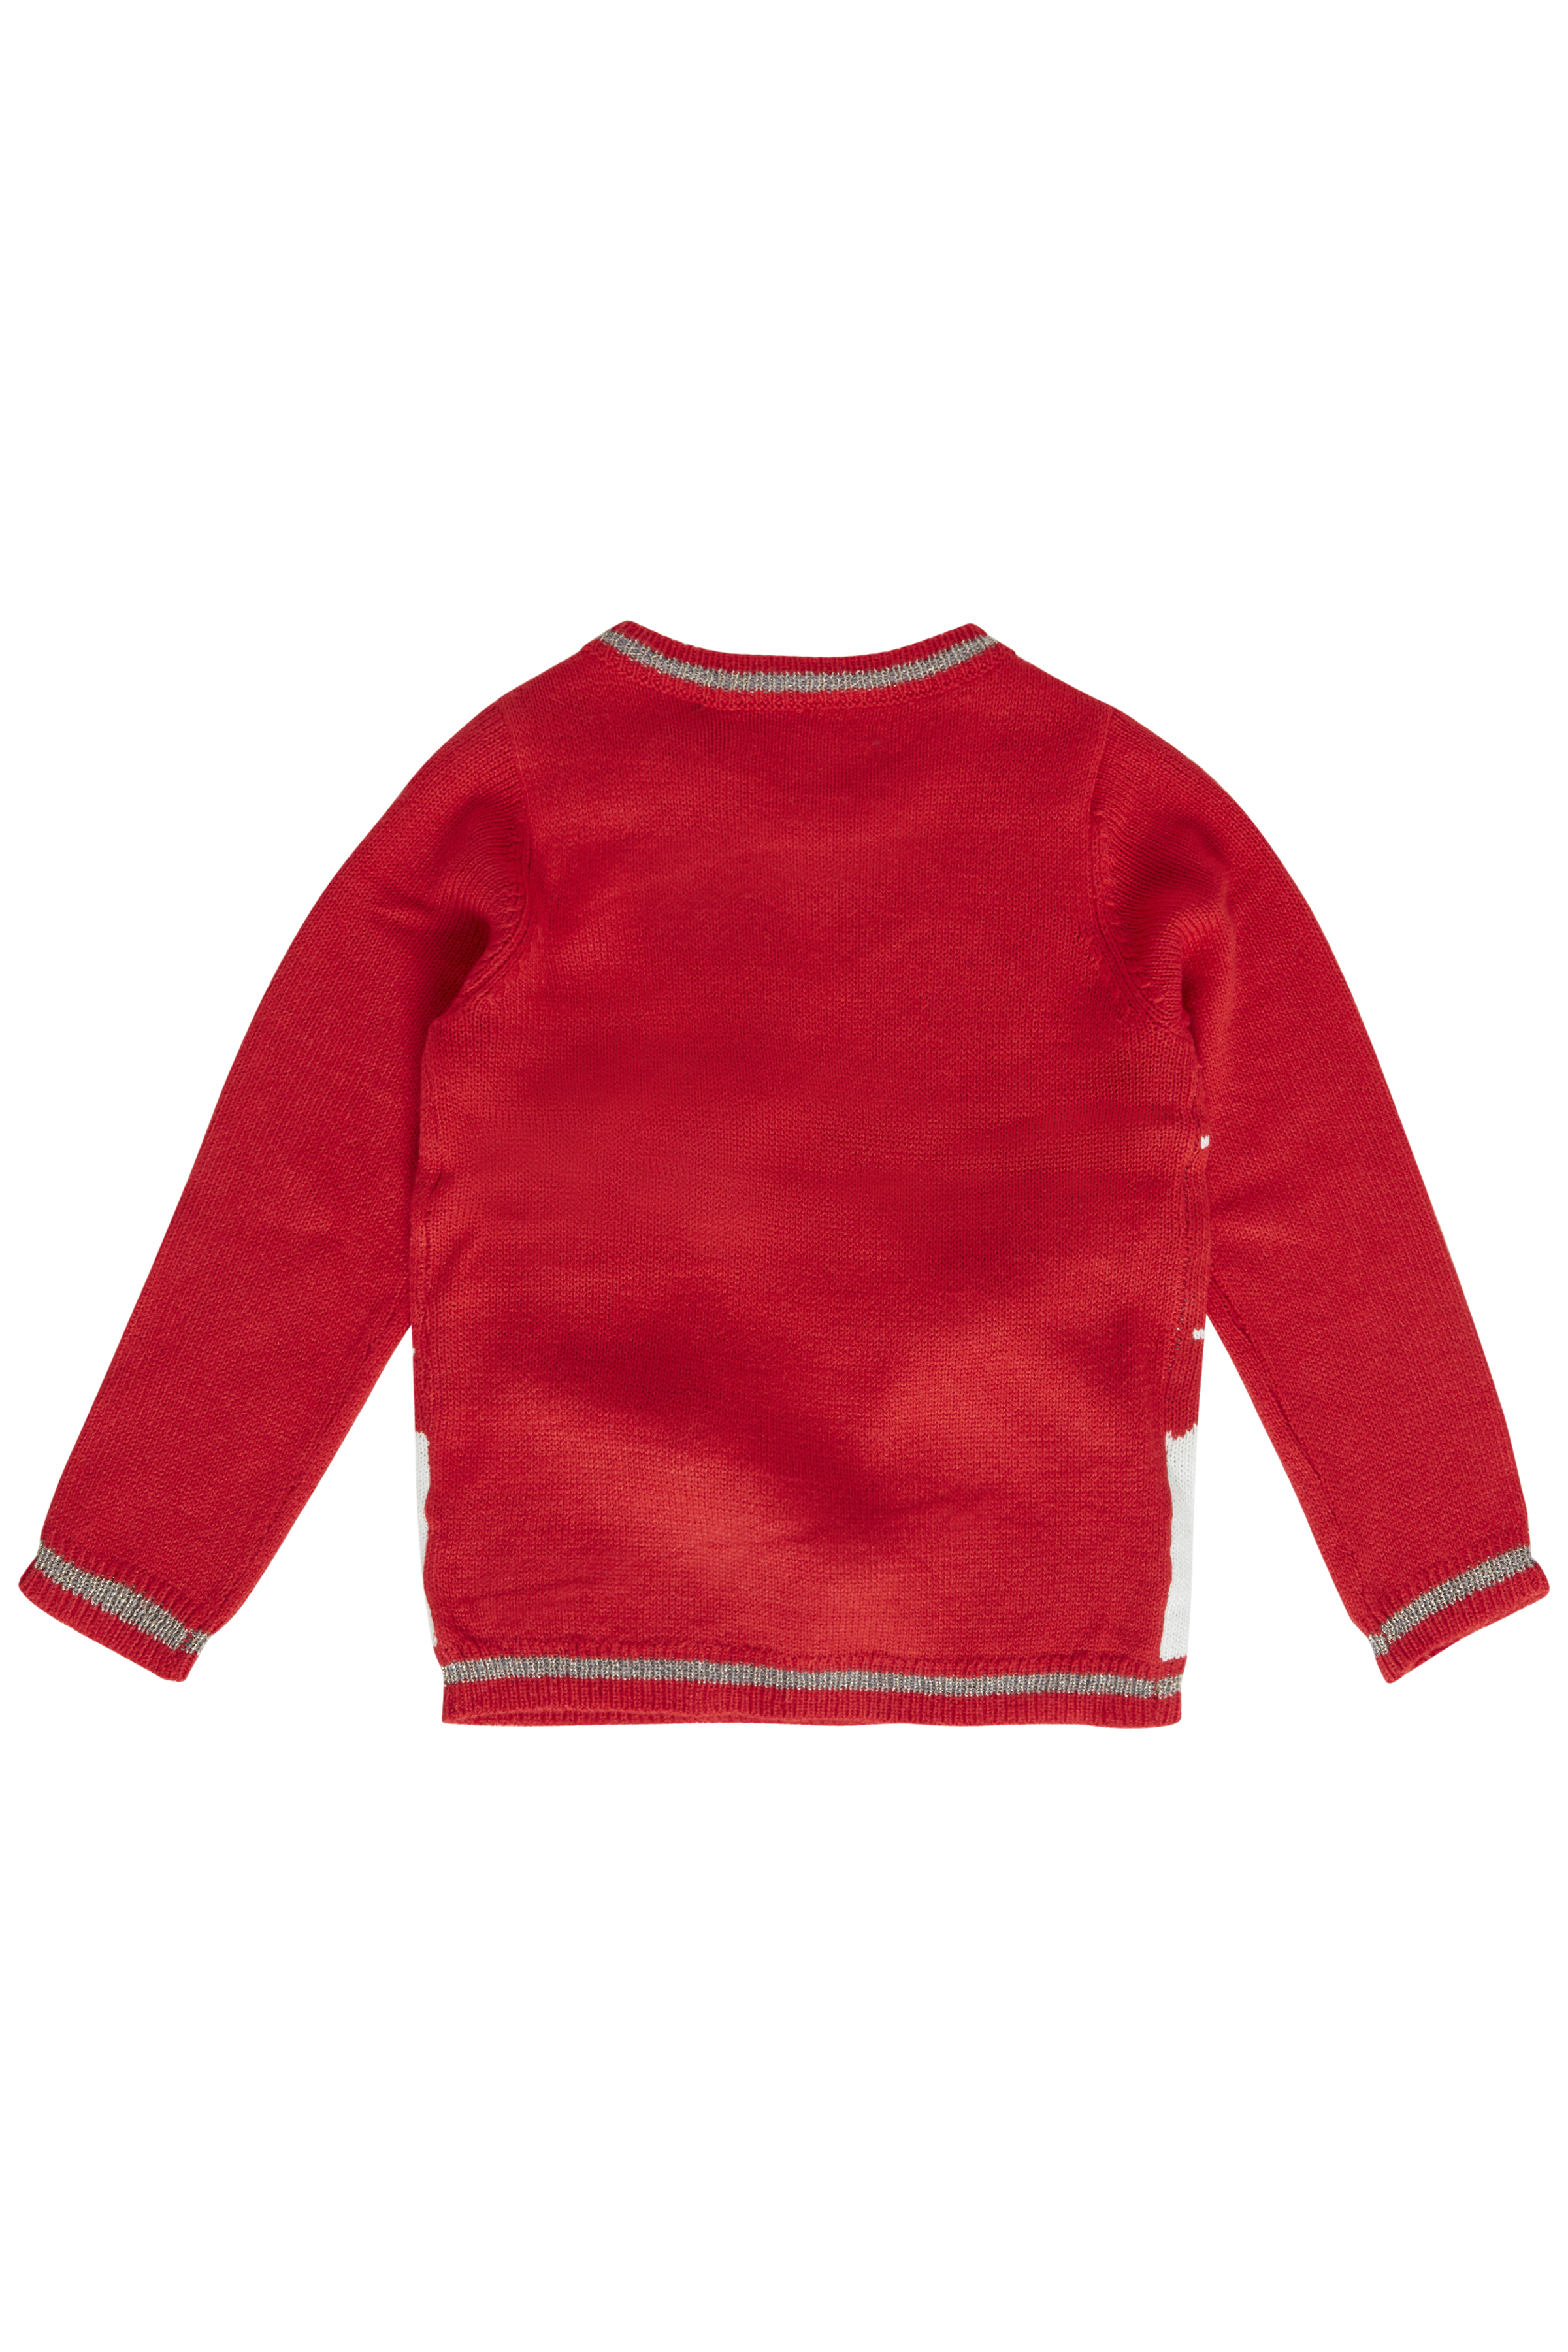 Chinese Red combi 3 Strikket pullover fra b.young - Kjøp Chinese Red combi 3 Strikket pullover fra størrelse 92-134/140 her